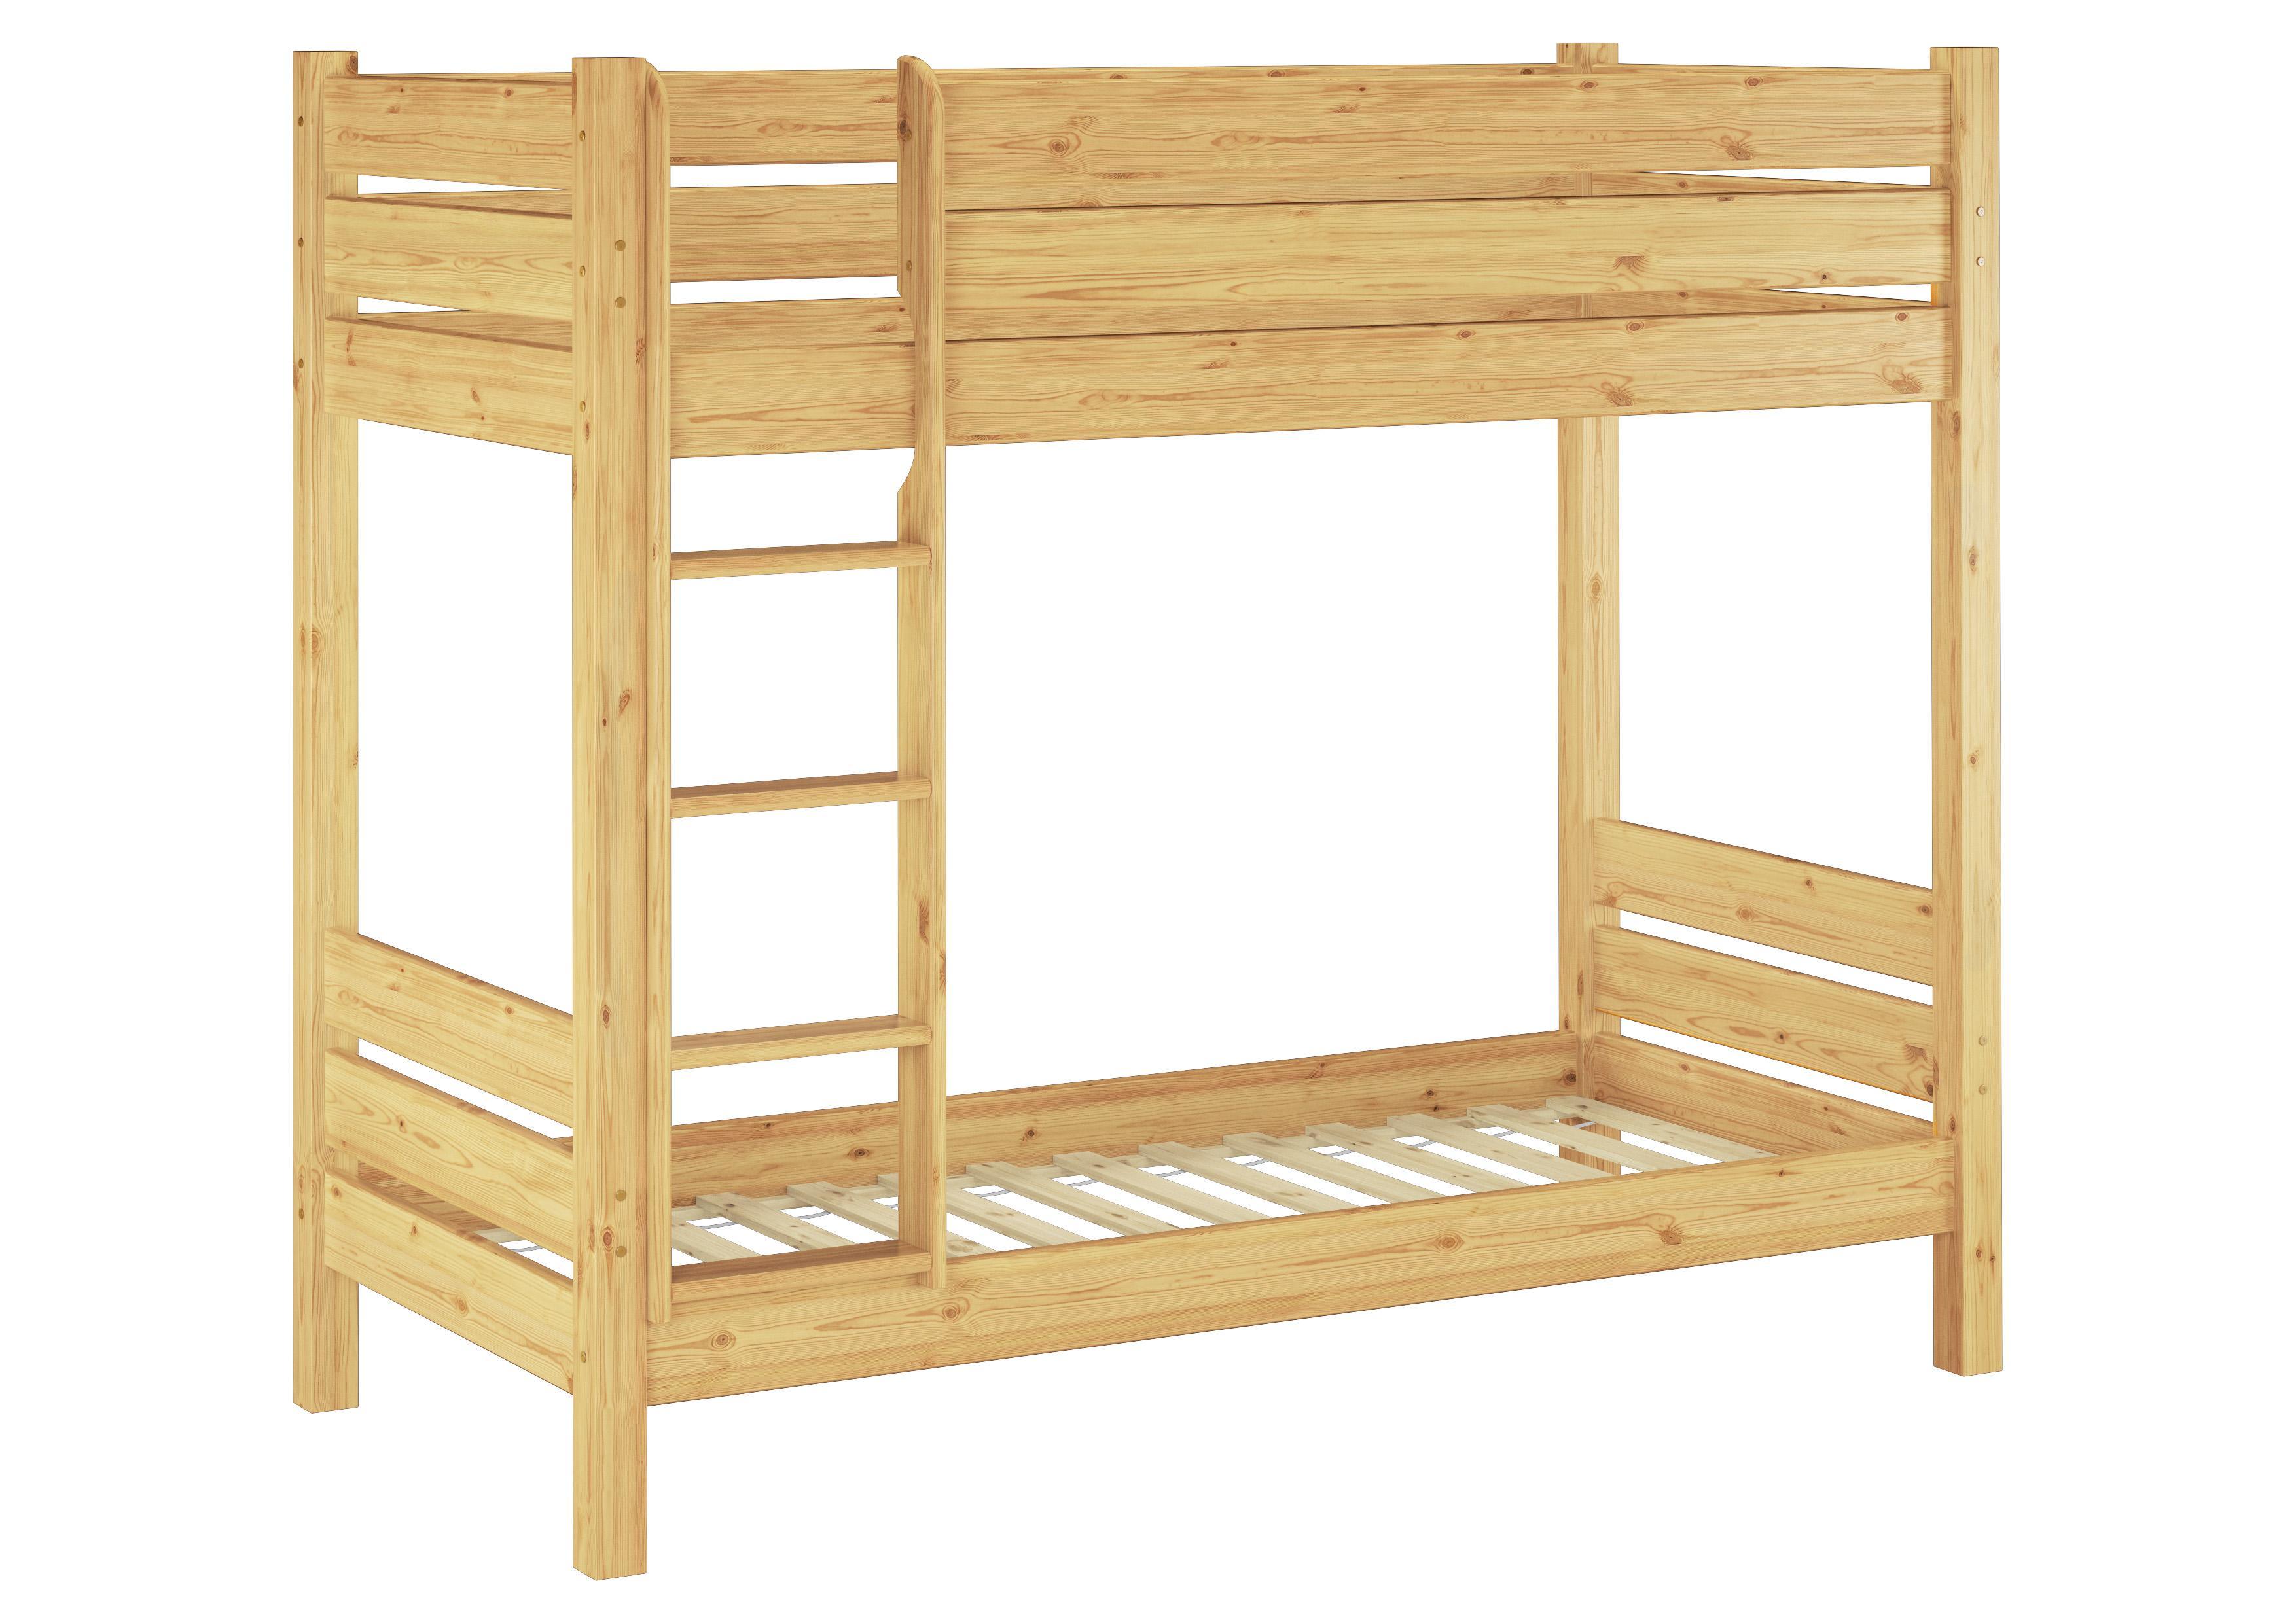 etagenbett fr erwachsene metall awesome kinderbett with. Black Bedroom Furniture Sets. Home Design Ideas